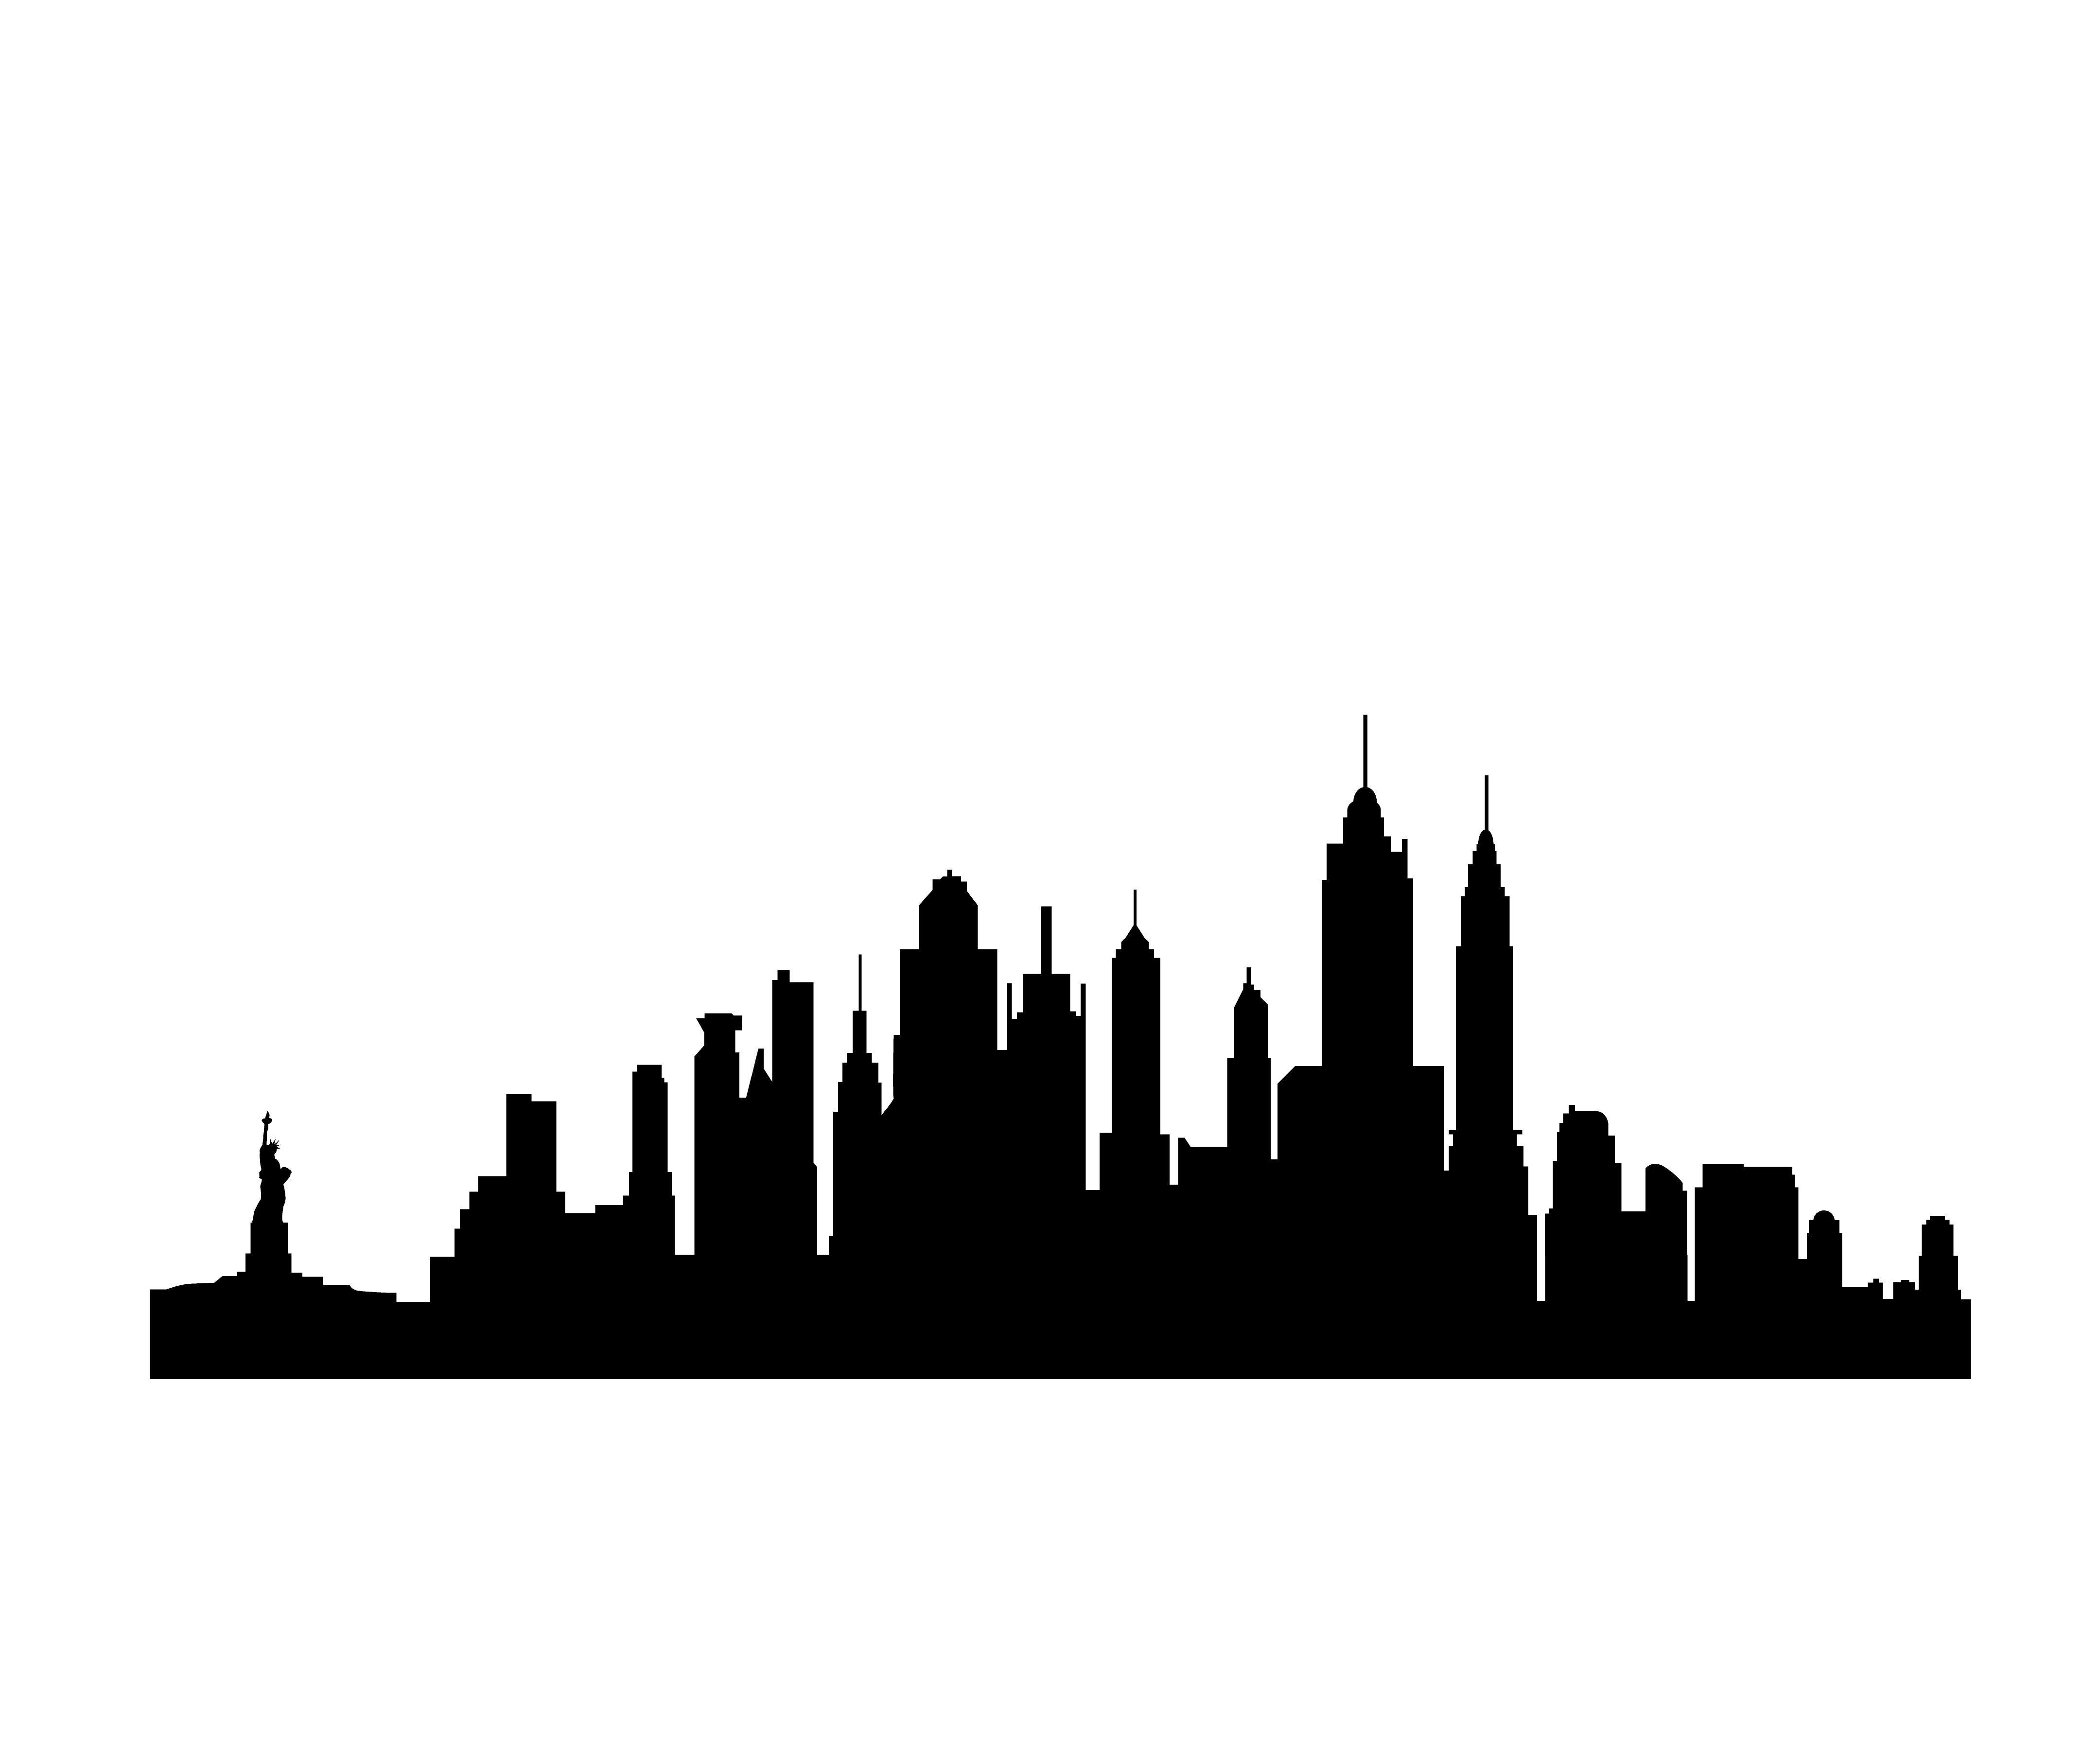 4320x3600 new york city marathon drawing luxury skyline new york silhouette